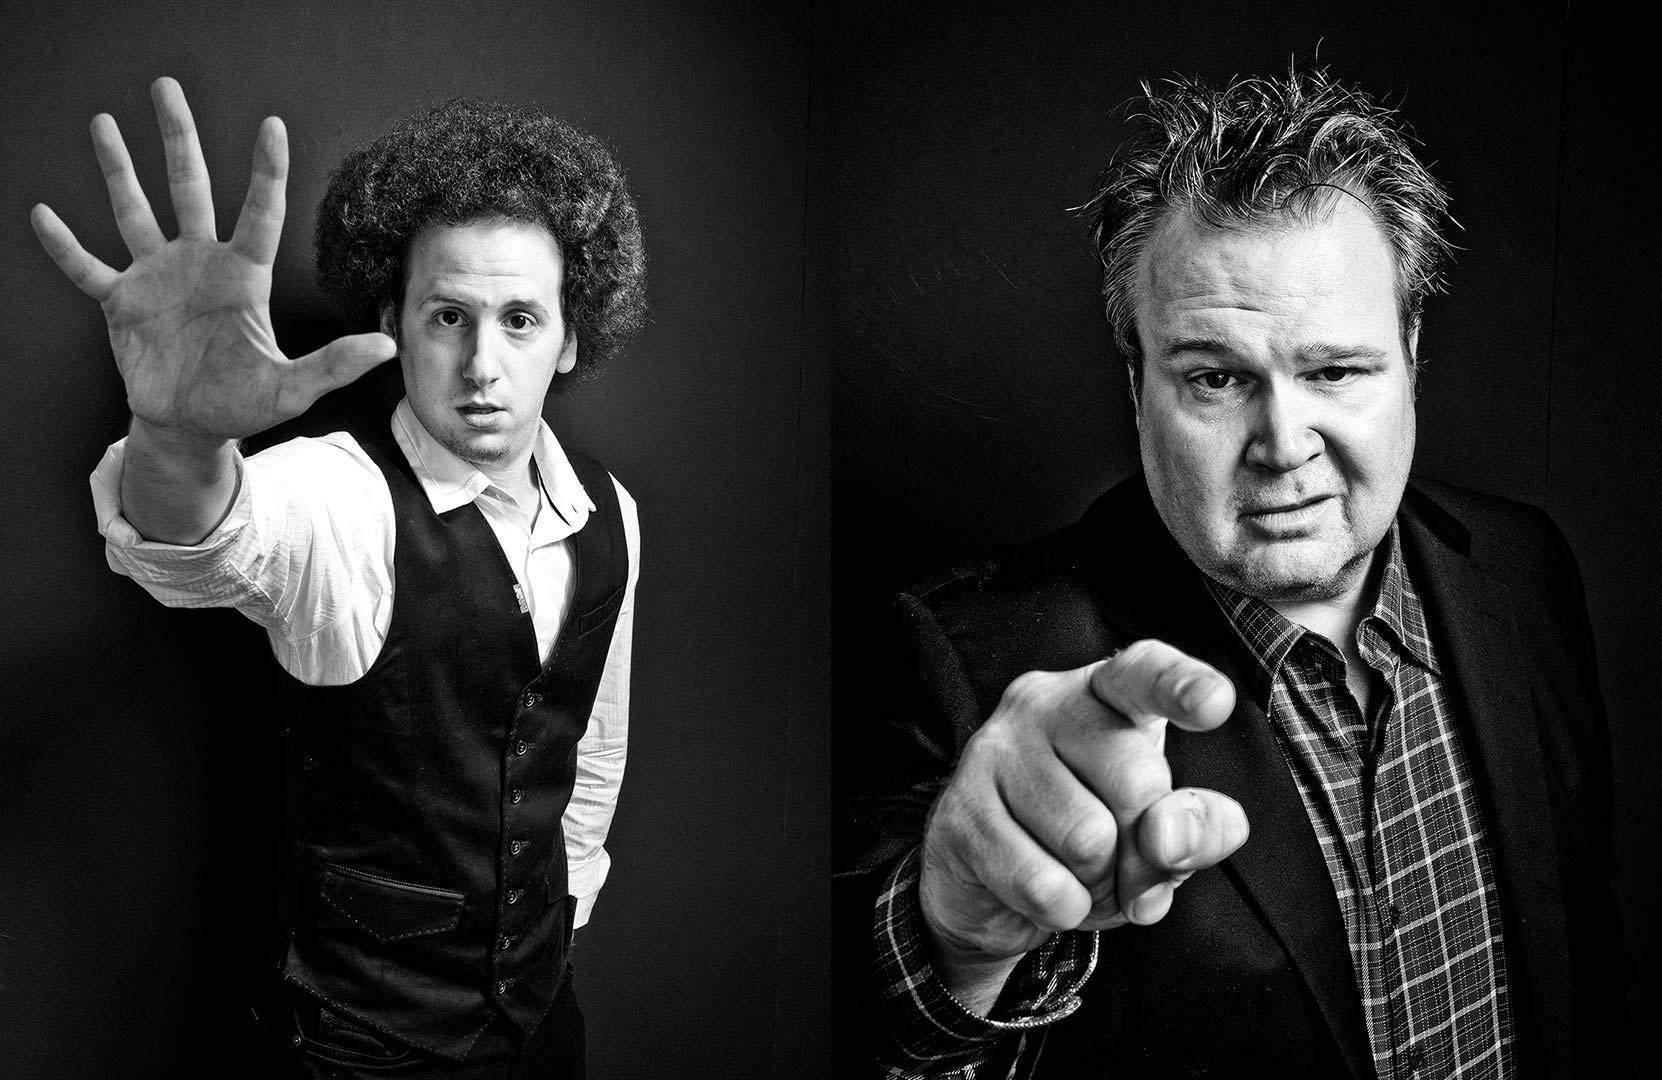 black & white portraits of actors Josh Sussman and Eric Stonestreet